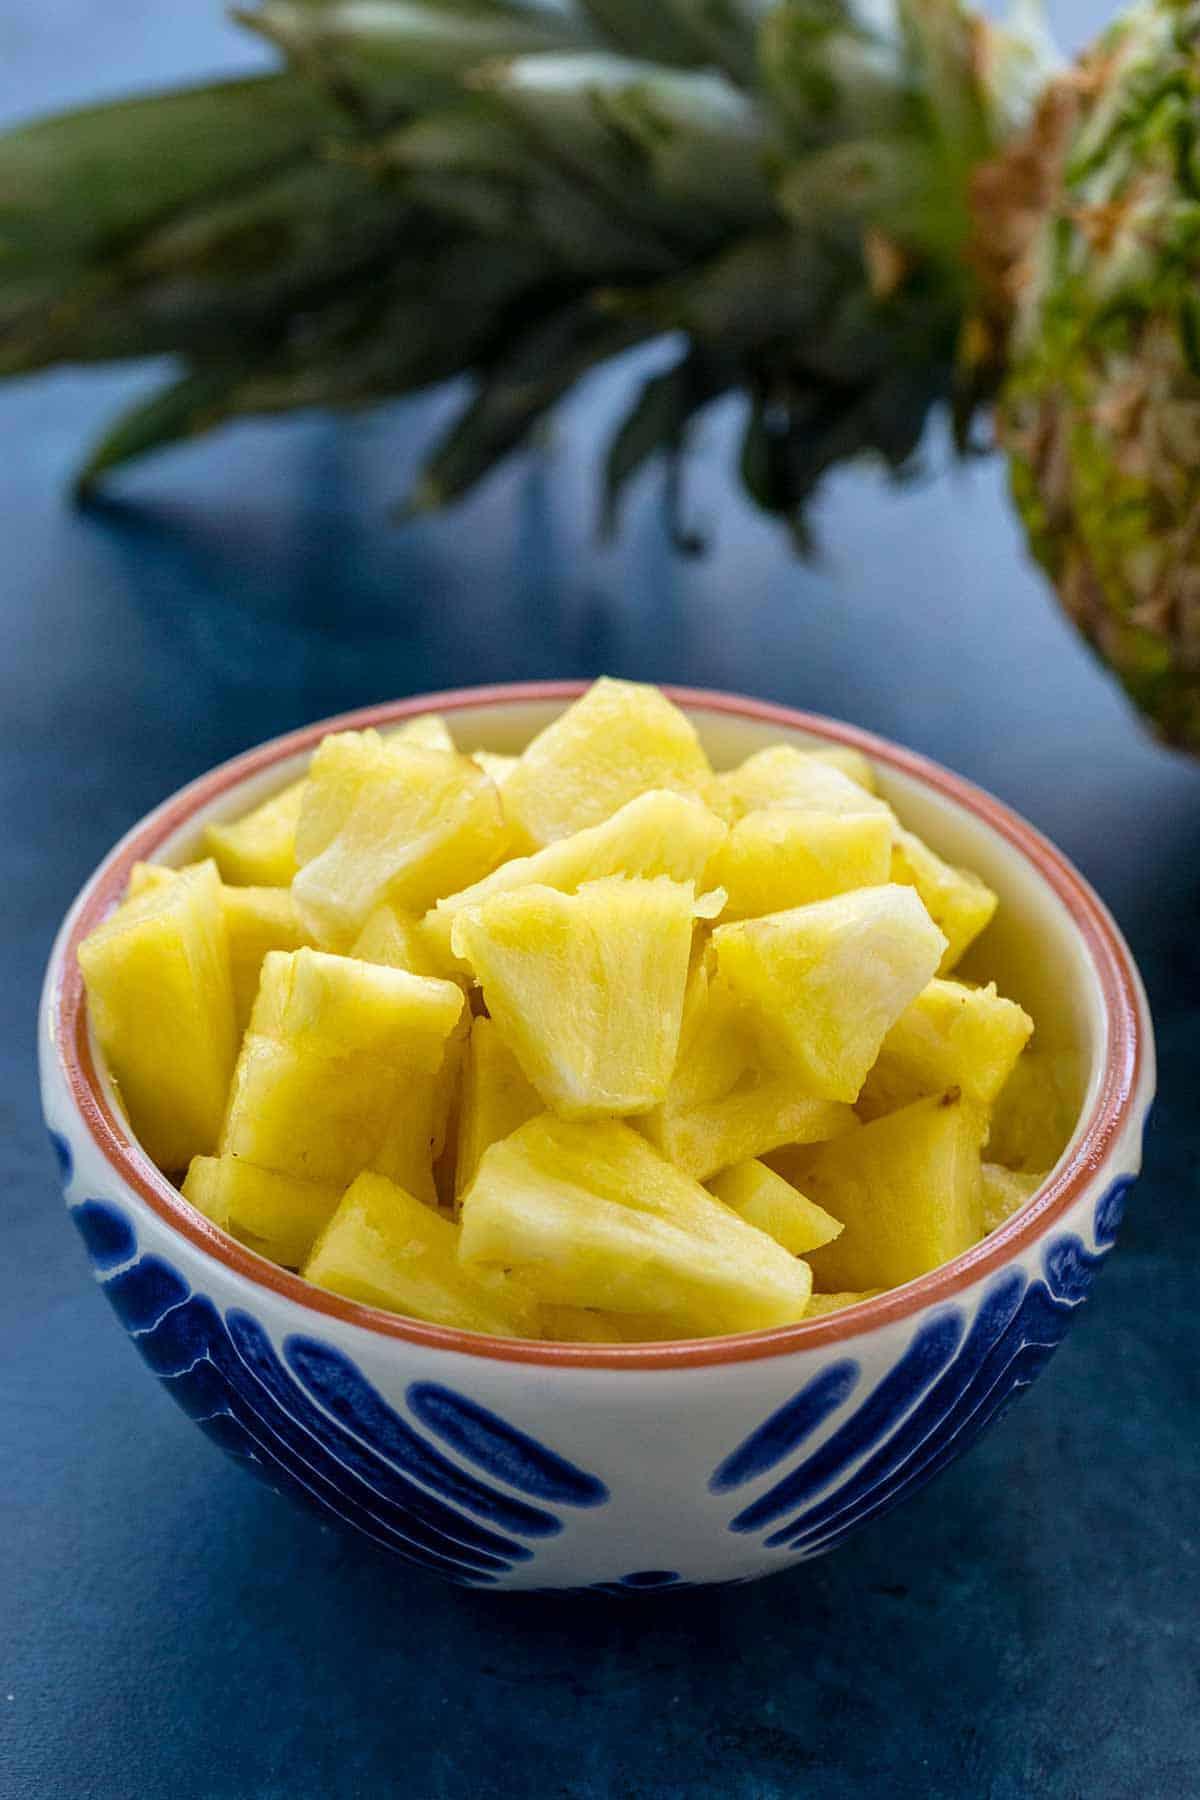 how to cut a pineapple bigcbit com agen resmi vimax